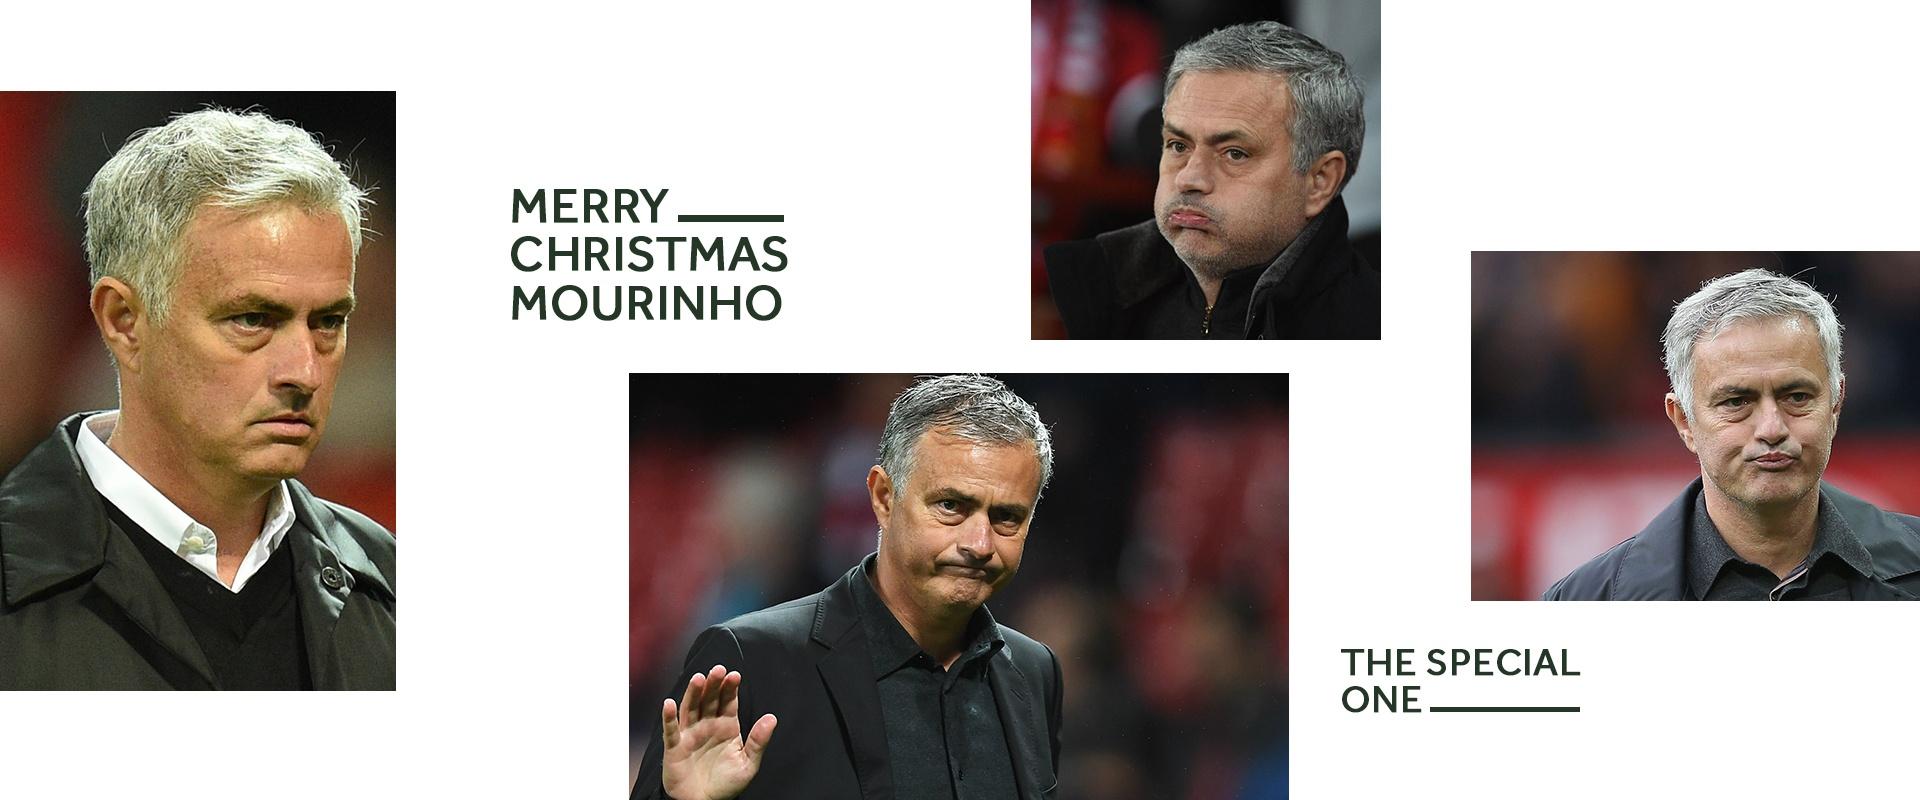 Jose Mourinho va cu nga tu dinh cao xuong vuc sau hinh anh 12